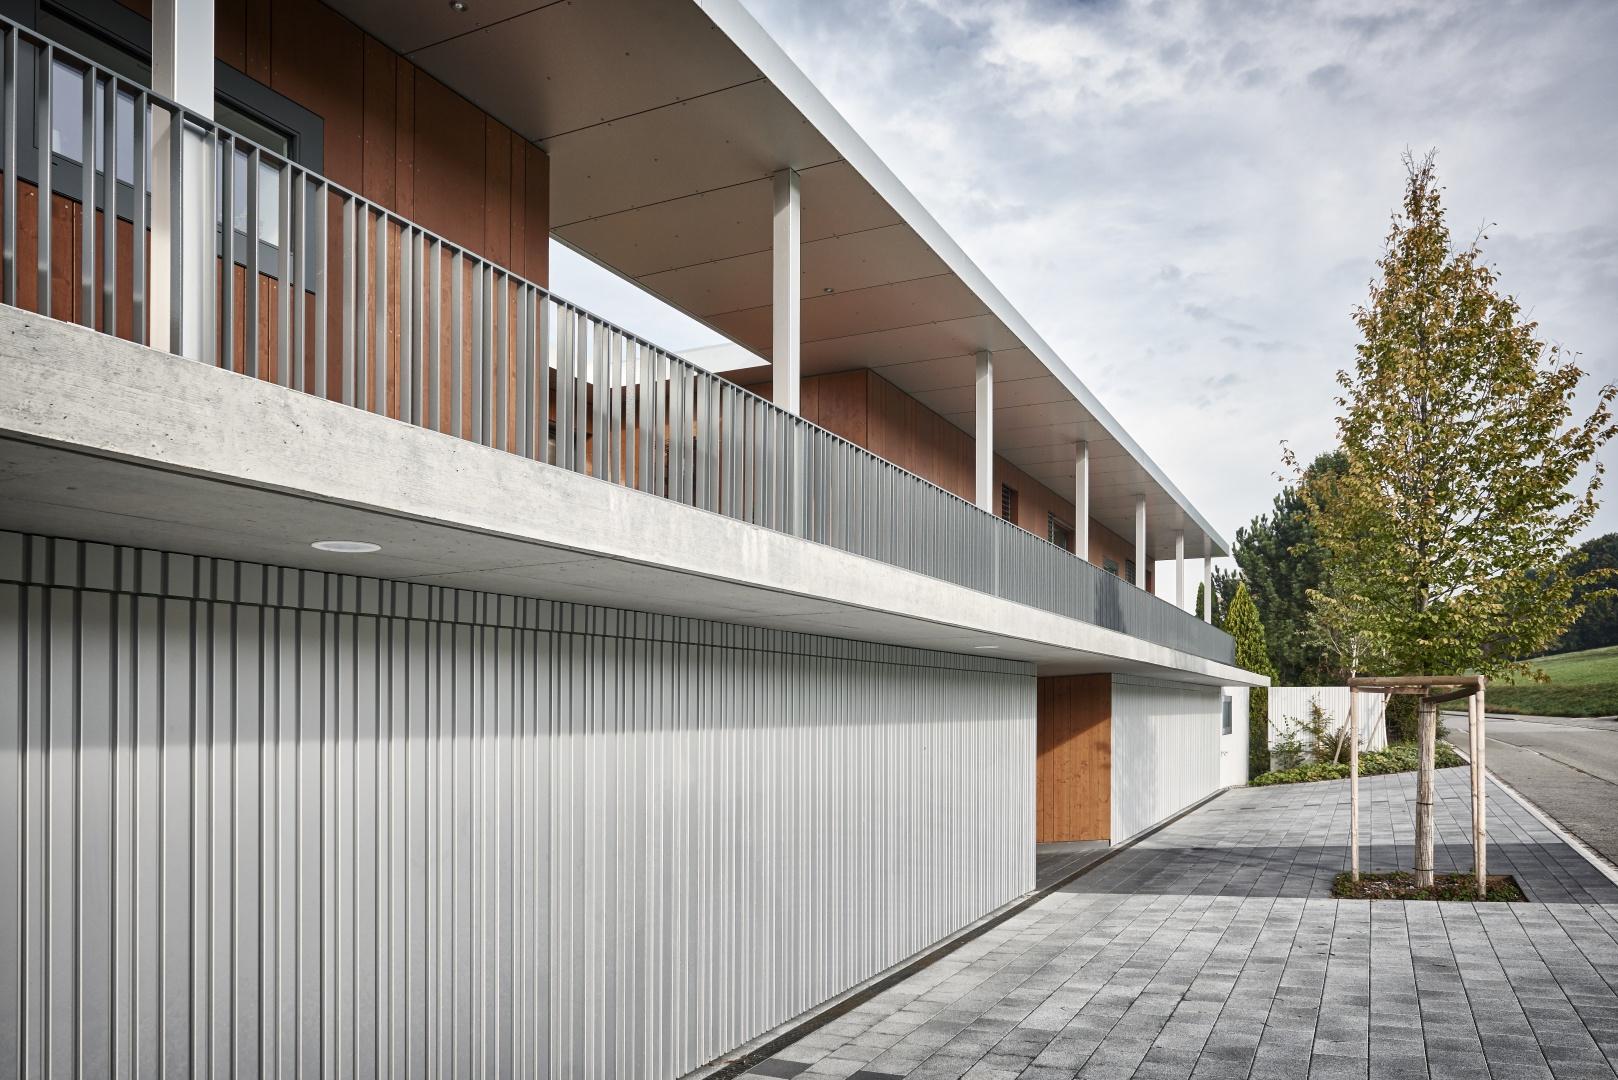 Aussenansicht_Garagentore © Hunziker Architekten AG